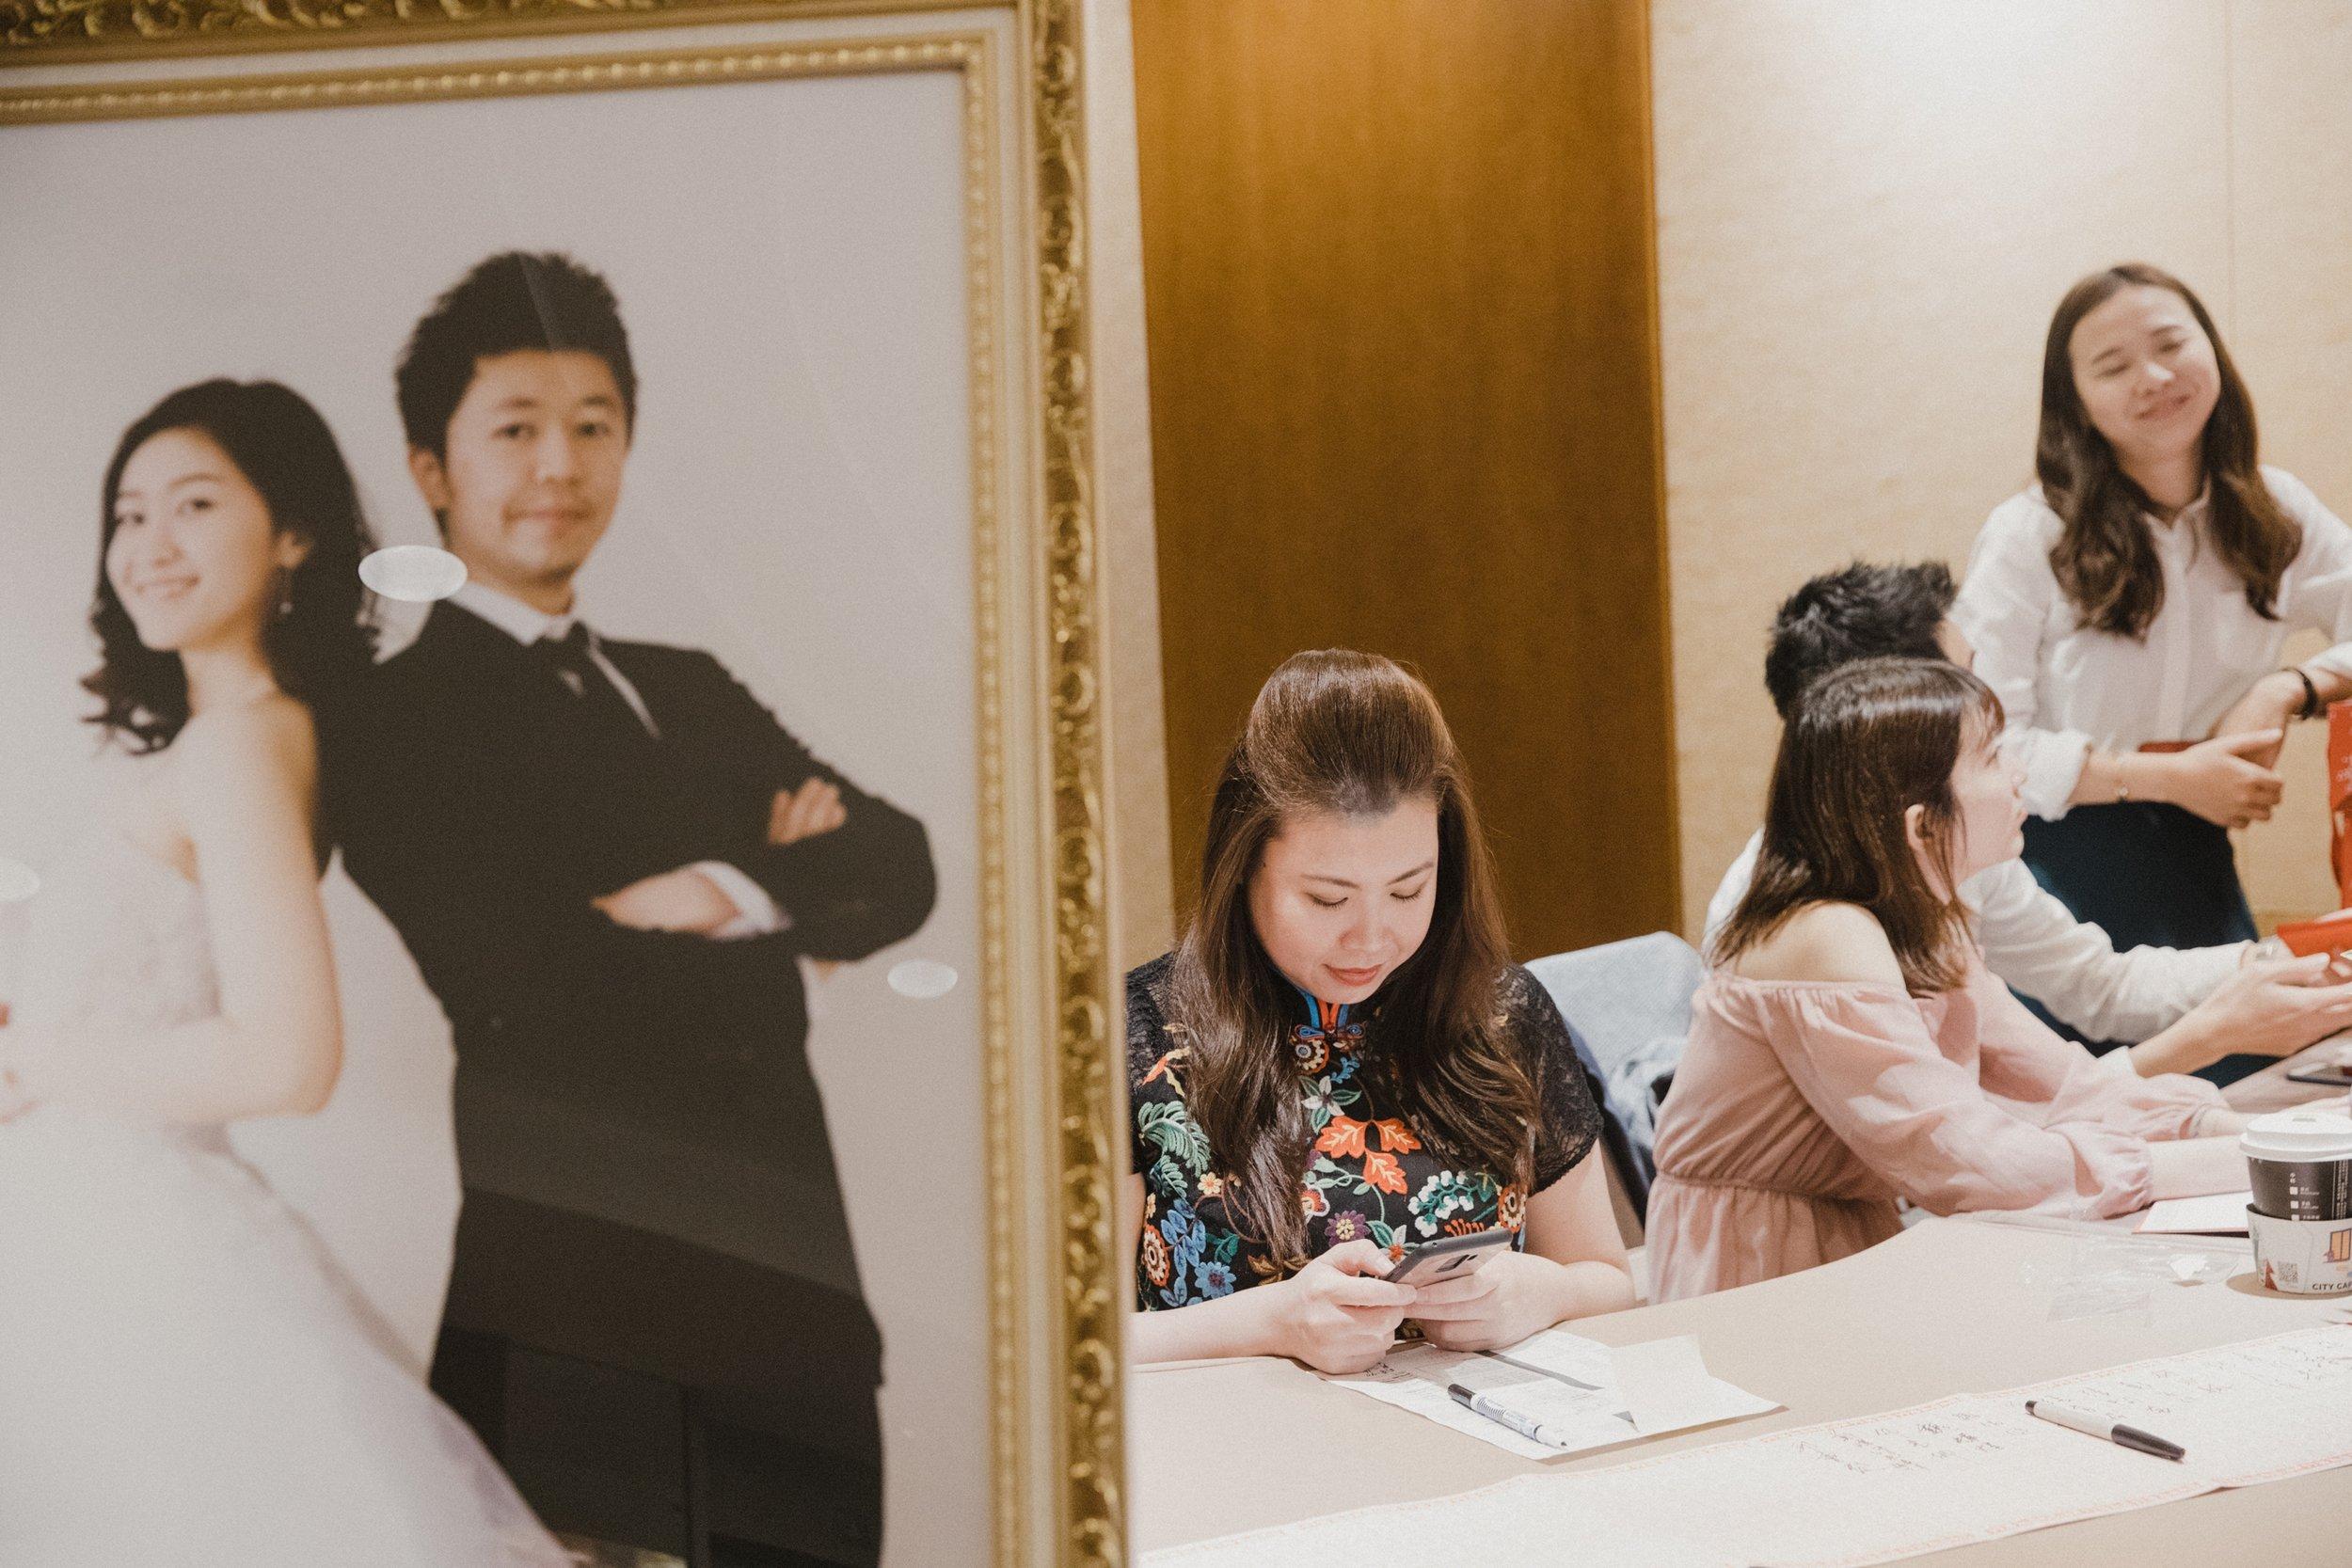 wedding-caridee-oscar-lunch-ambassador-hsinchu-結婚午宴-新竹國賓_40.jpg